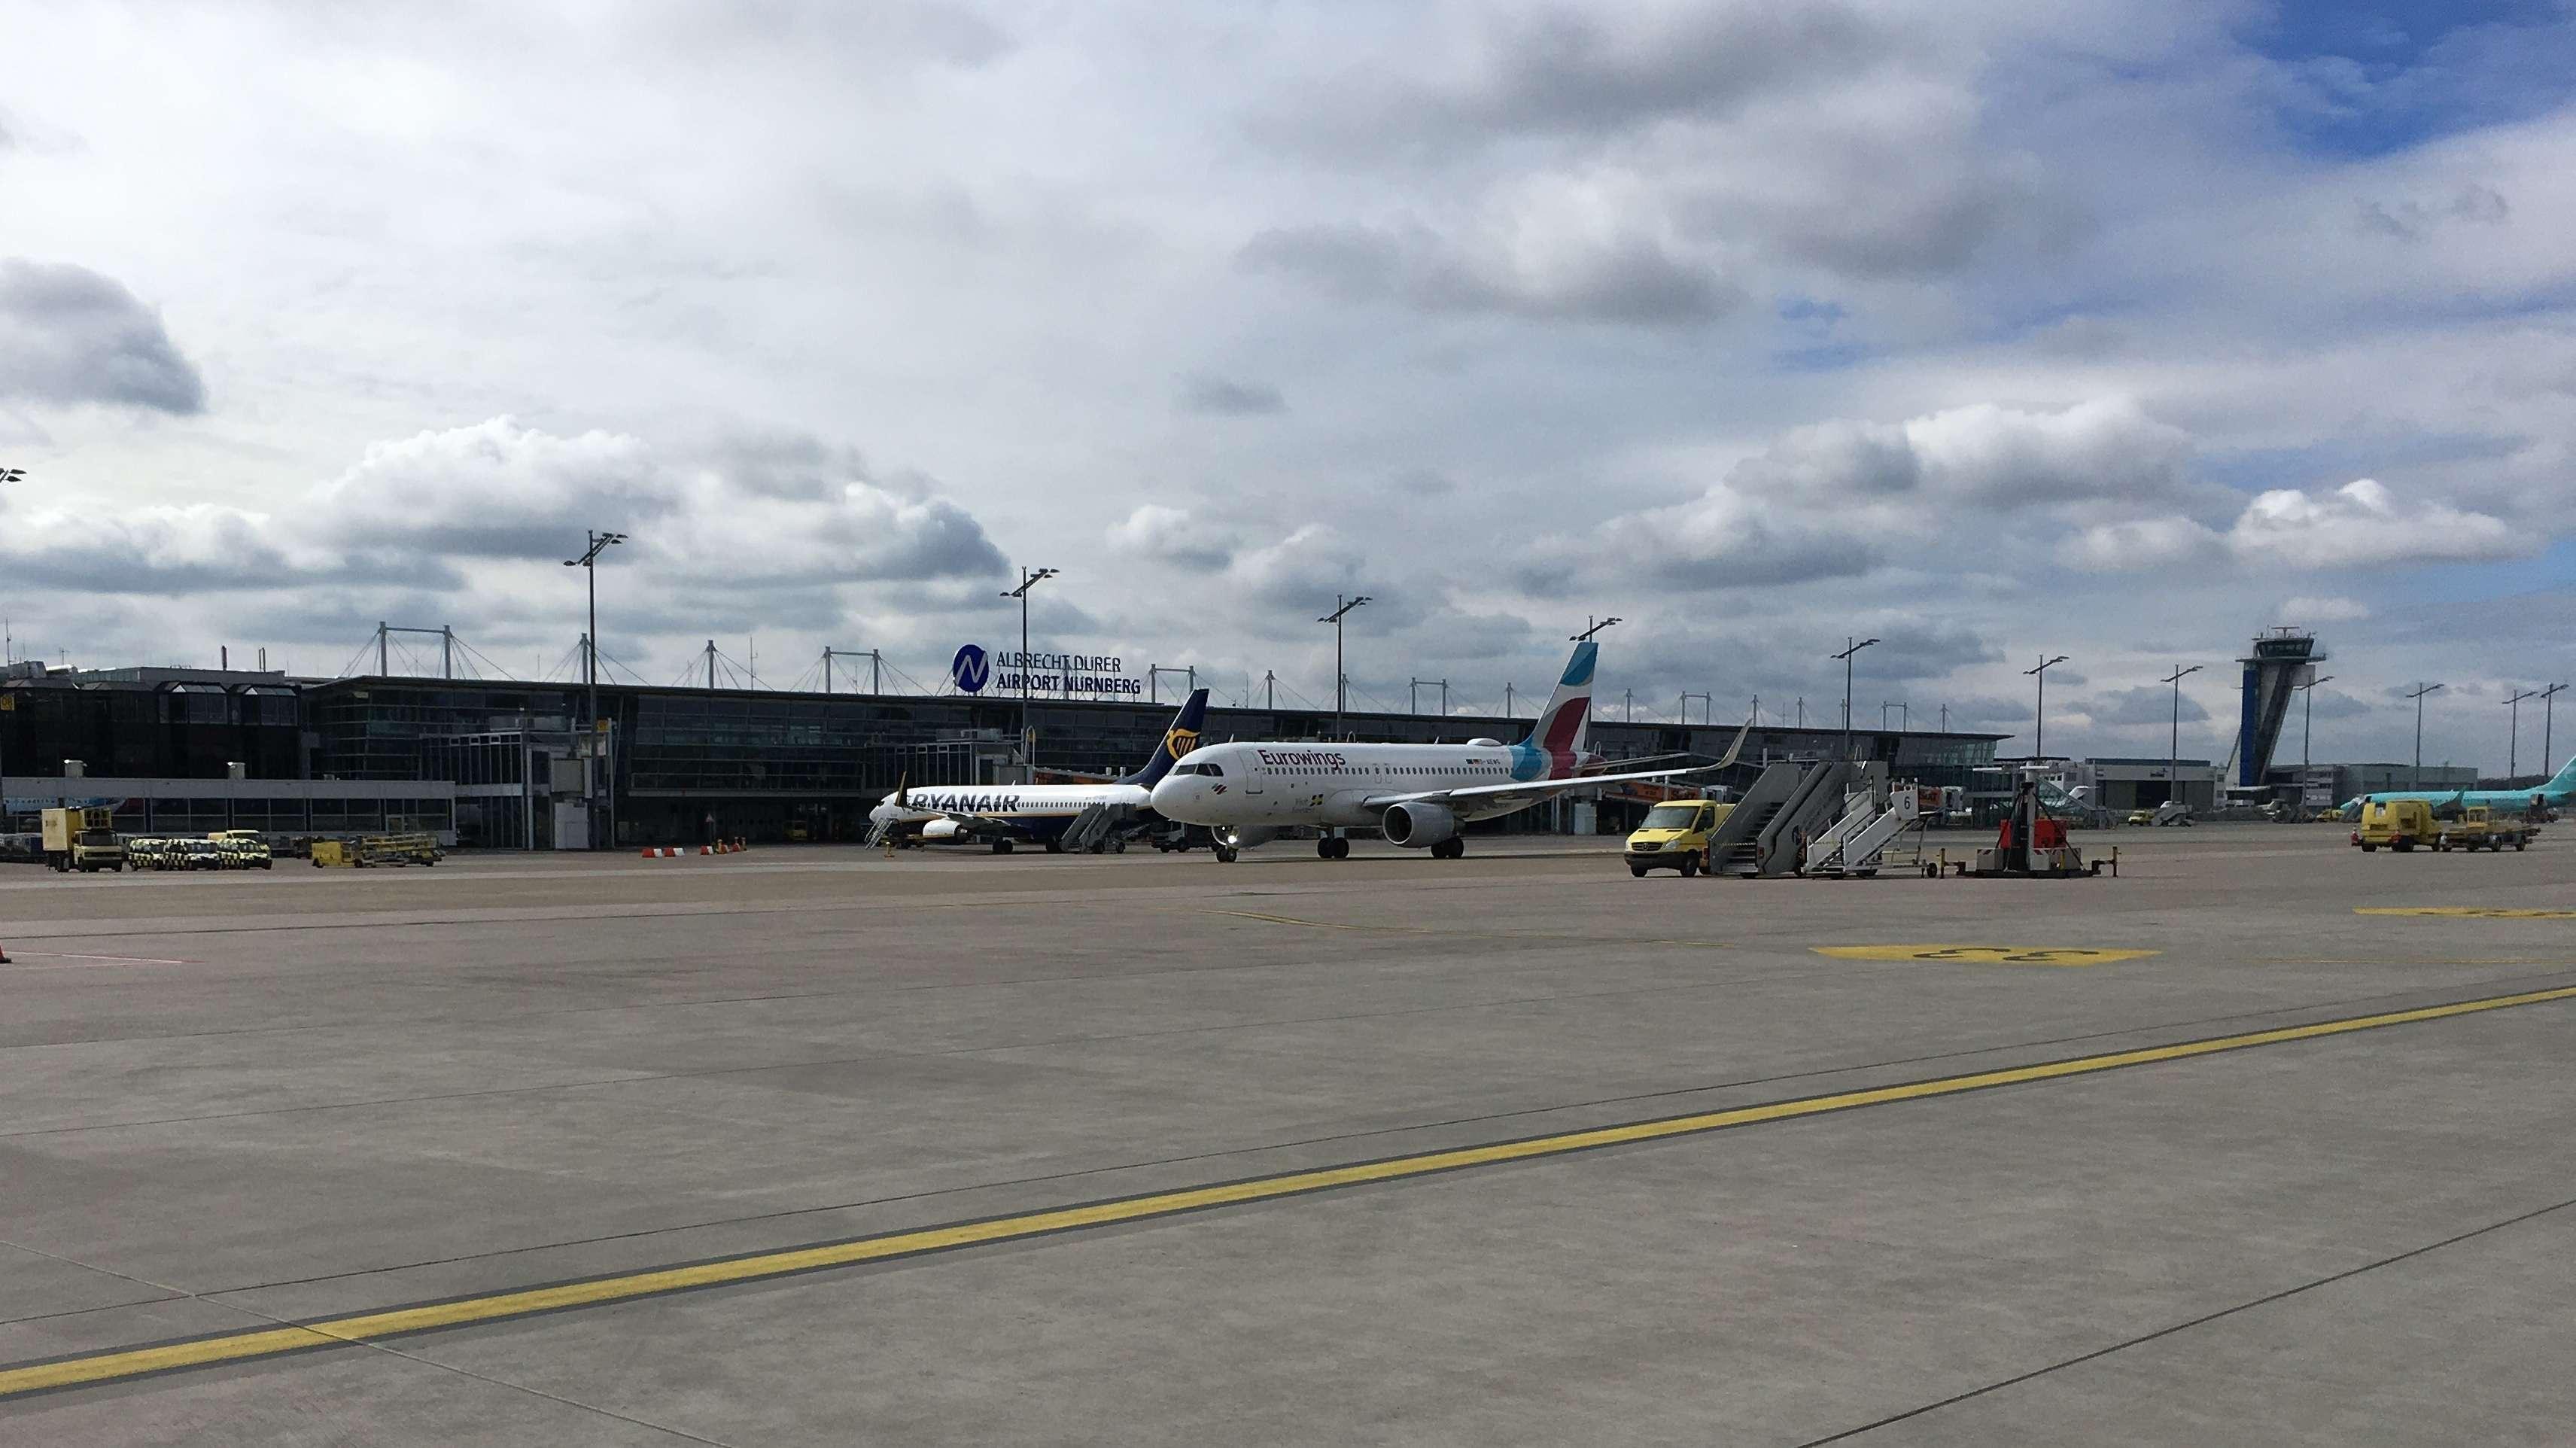 Flugzeug am Nürnberger Flughafen